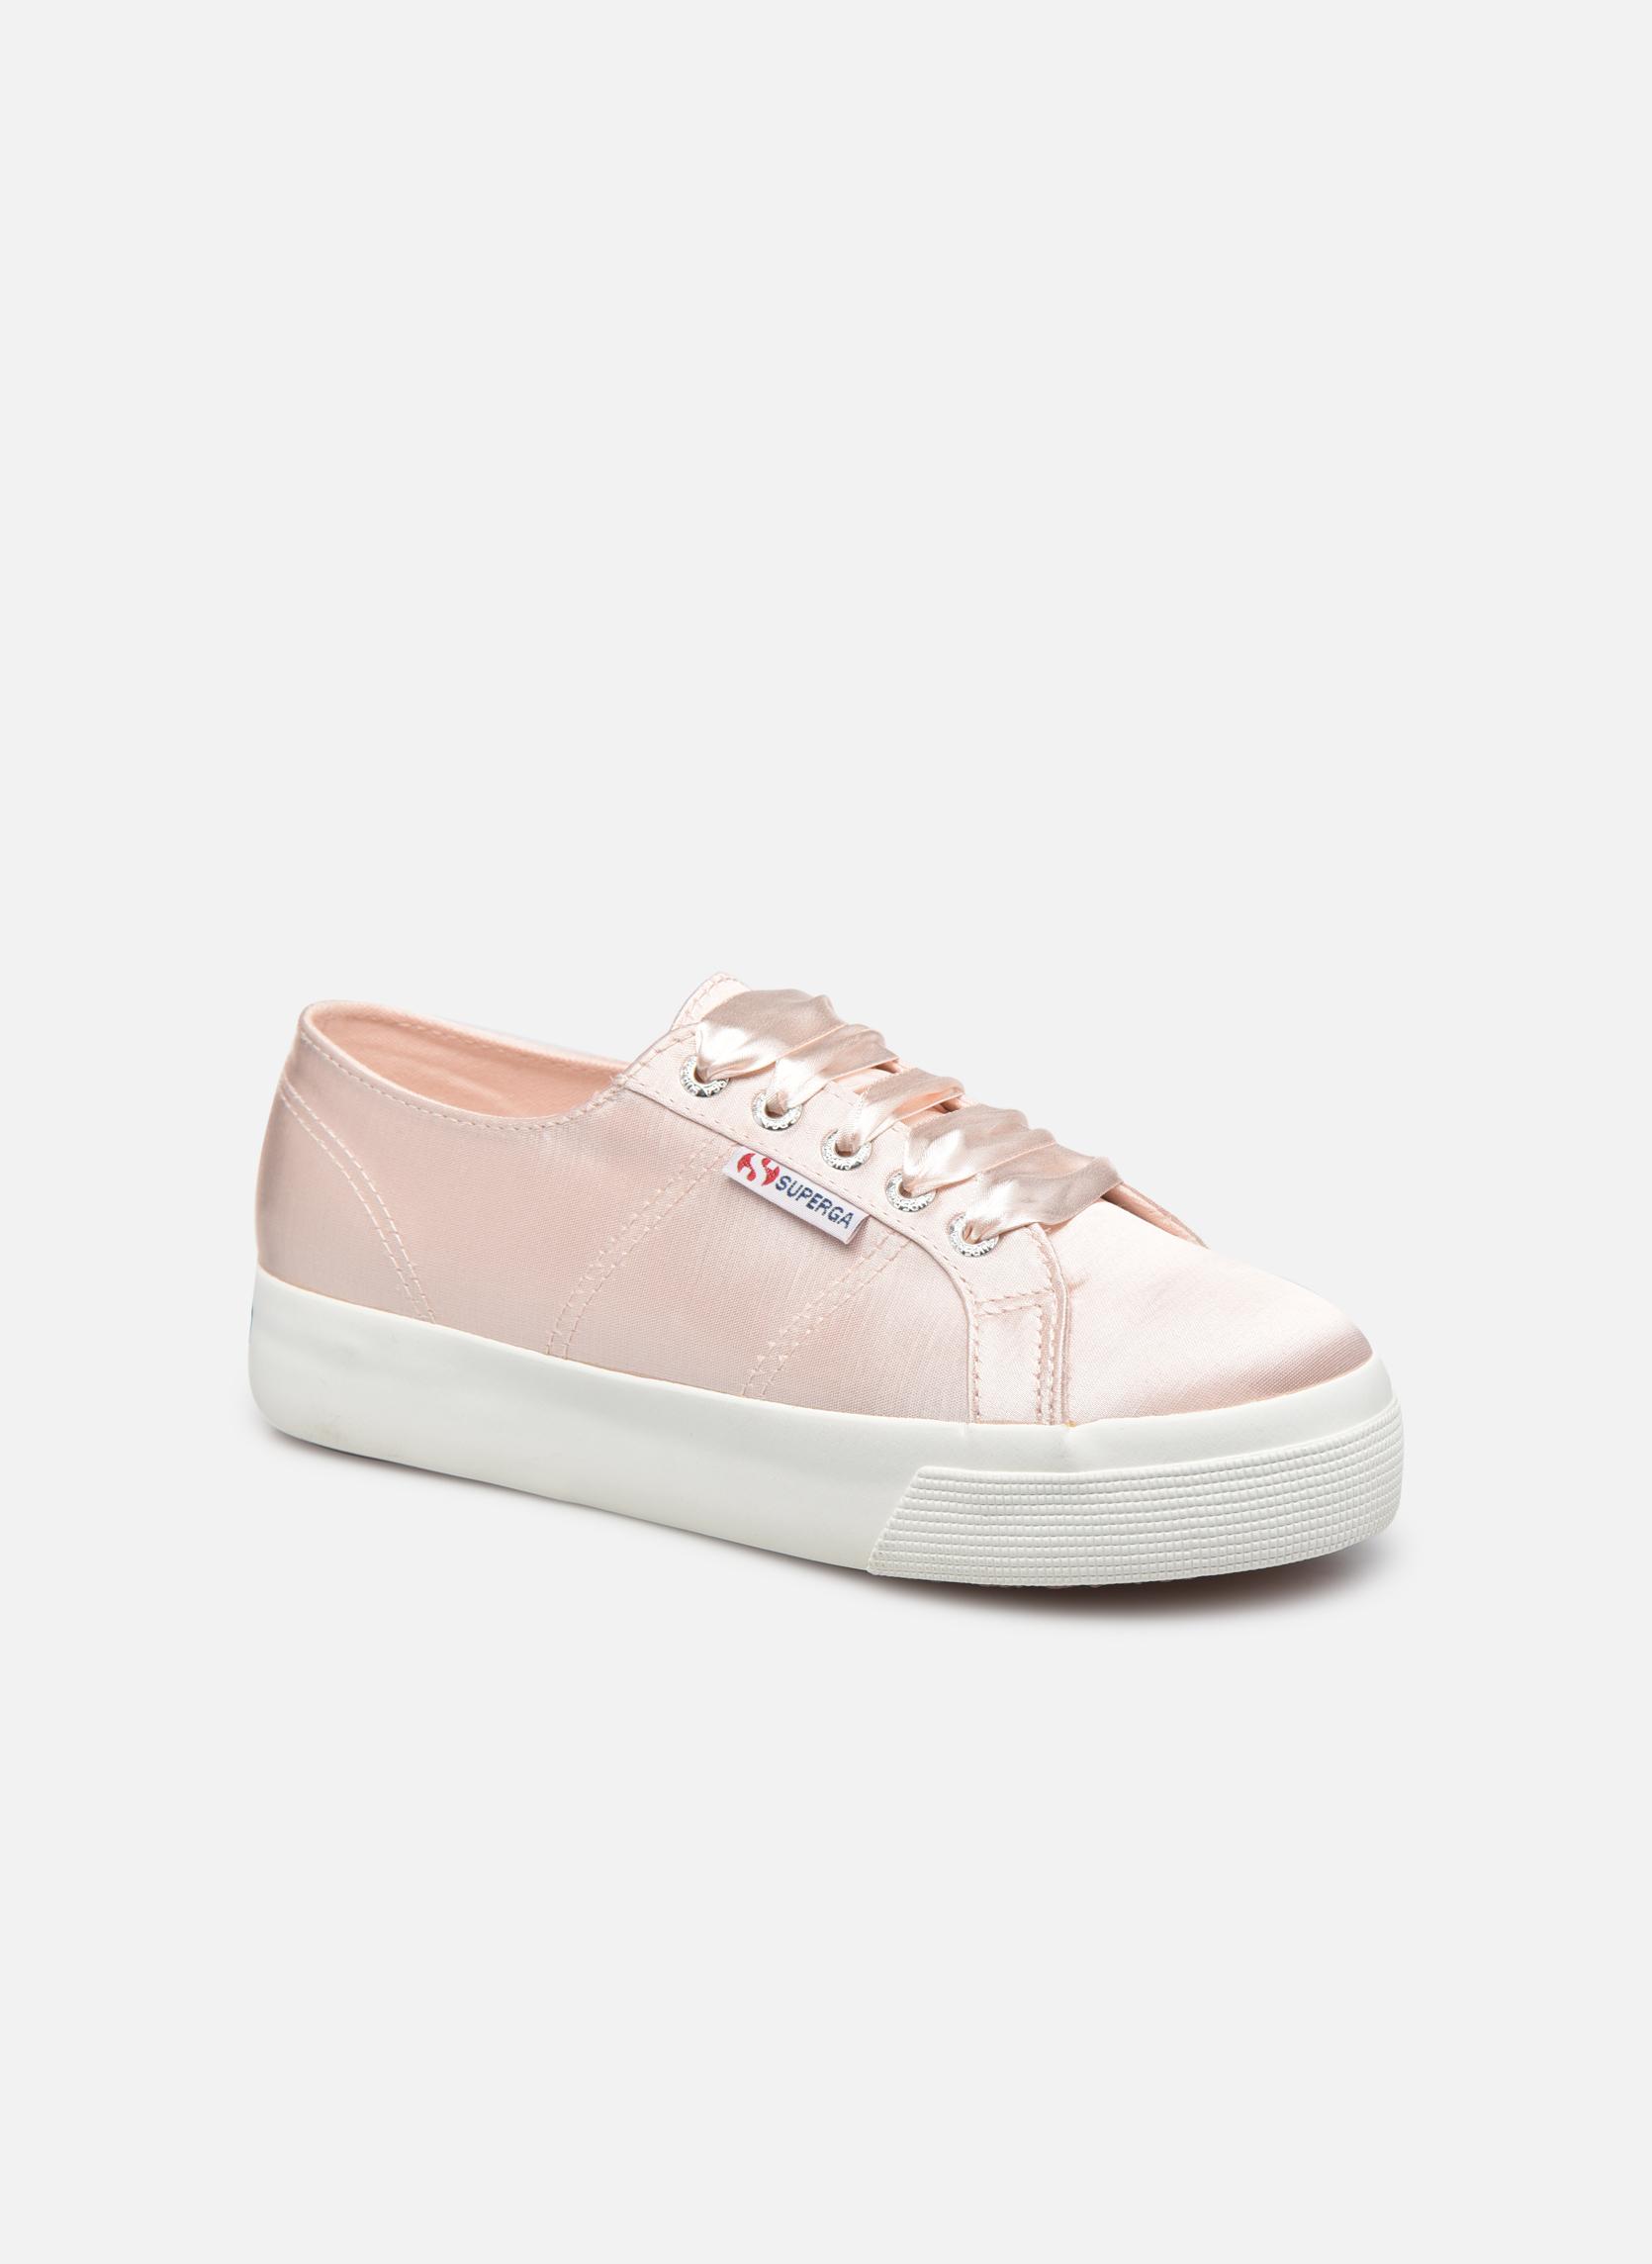 Sneaker Damen 2731 Satin W